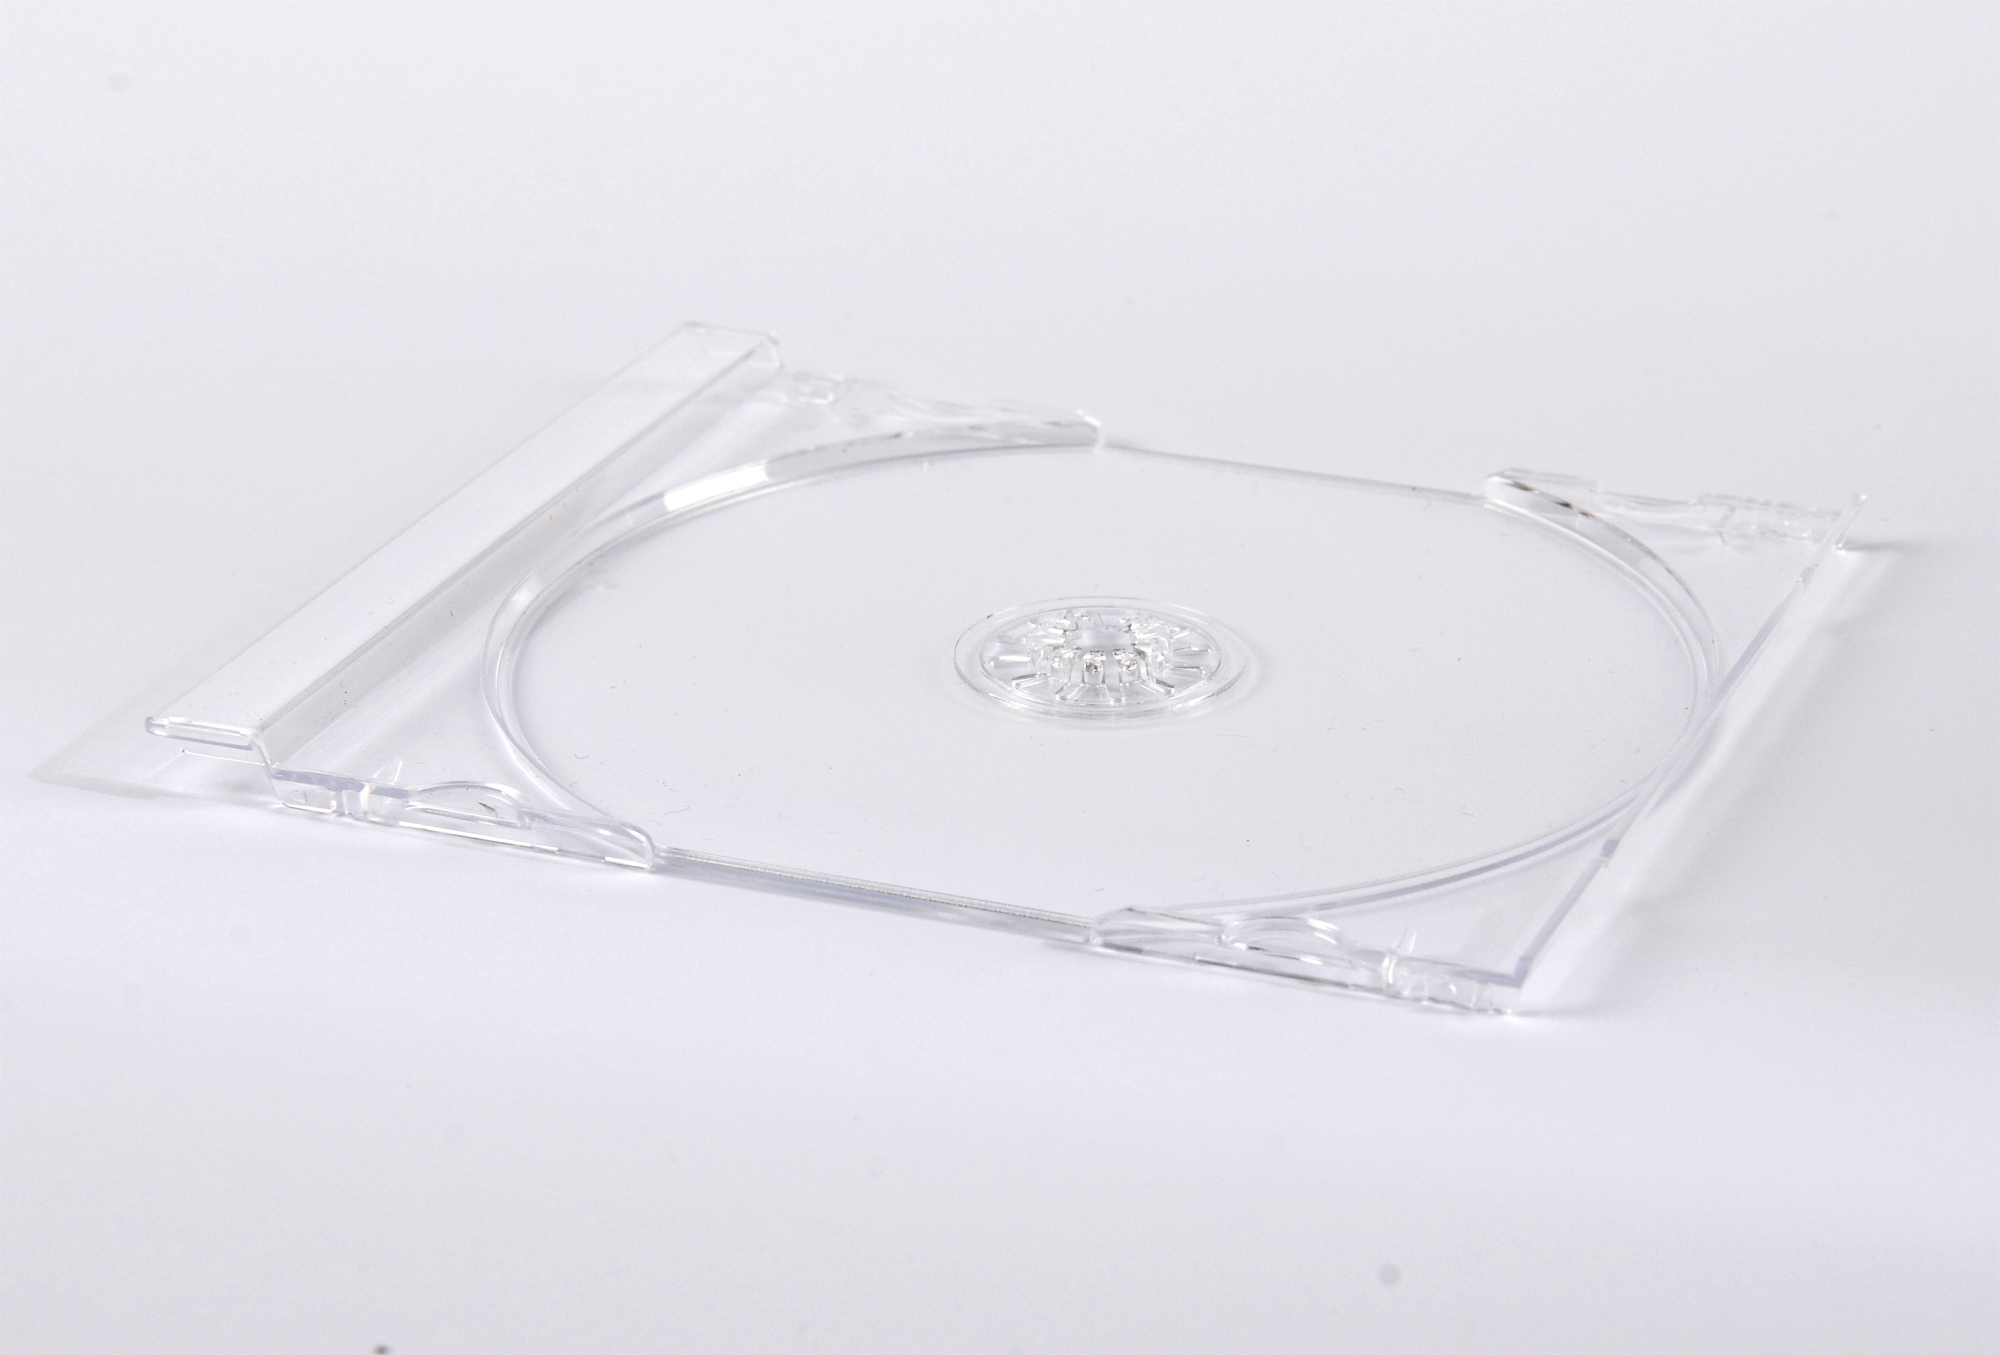 Etui CD Tray